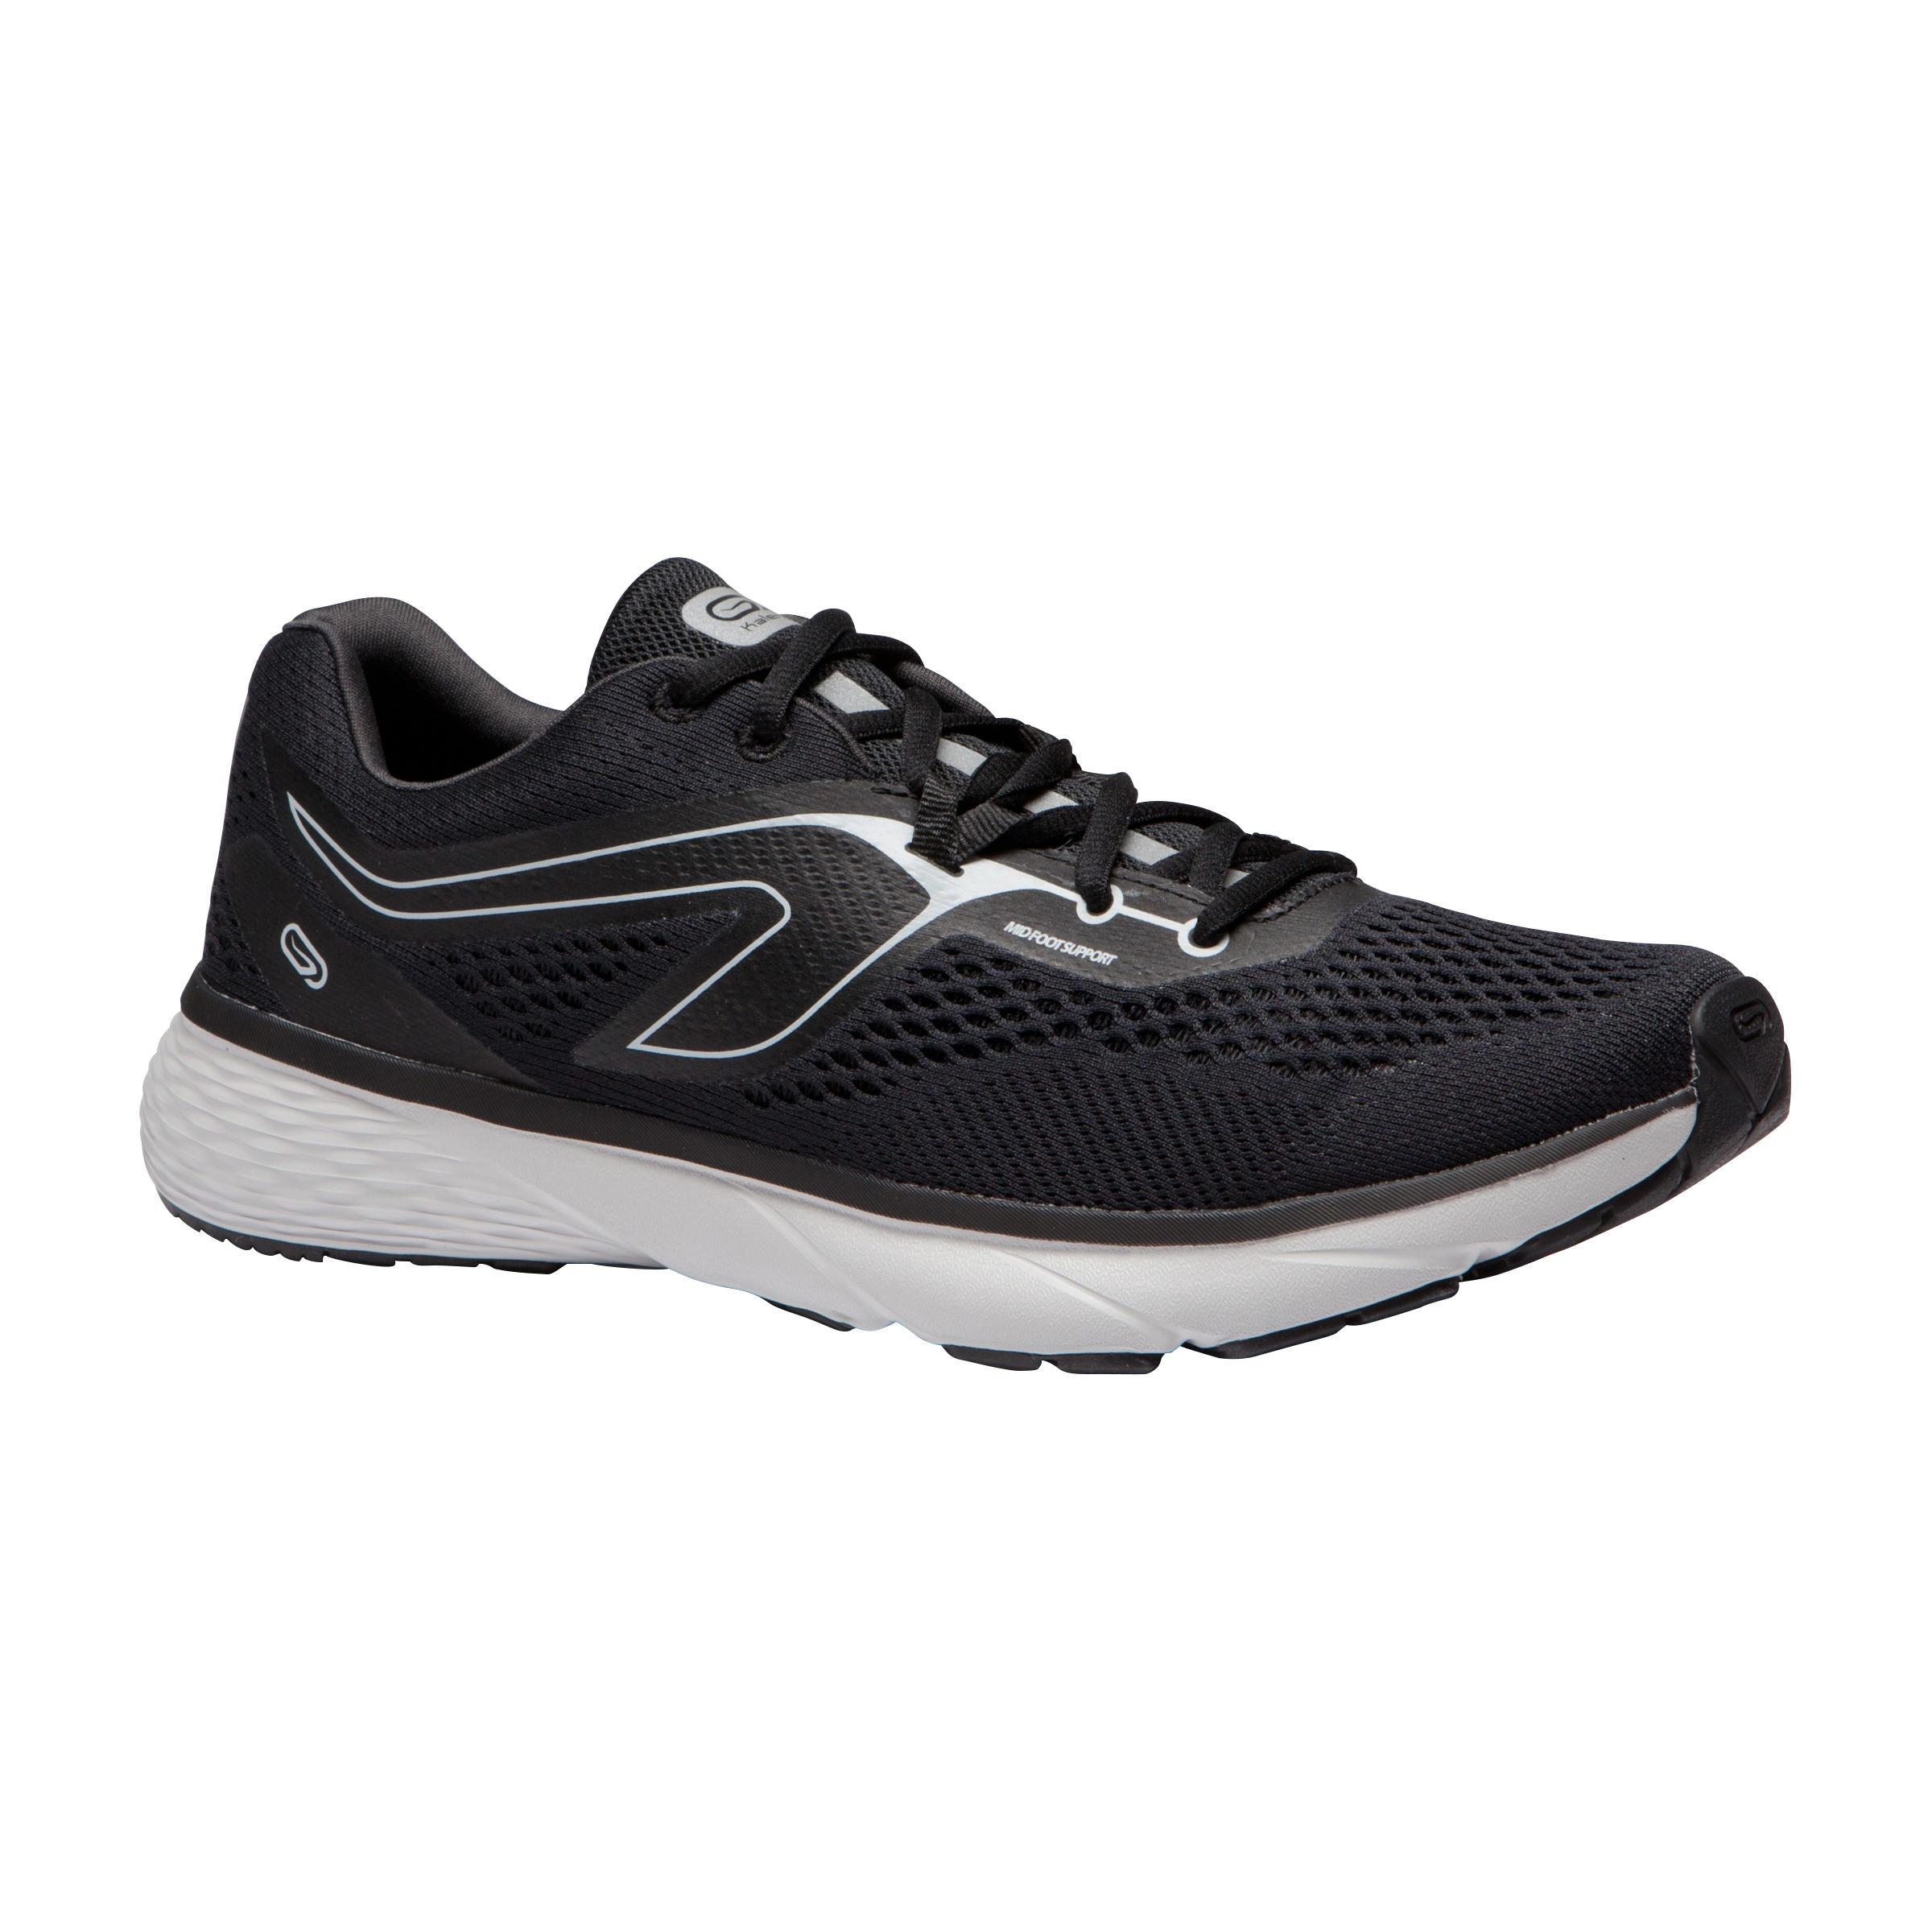 RUN SUPPORT MEN'S RUNNING SHOES - Decathlon